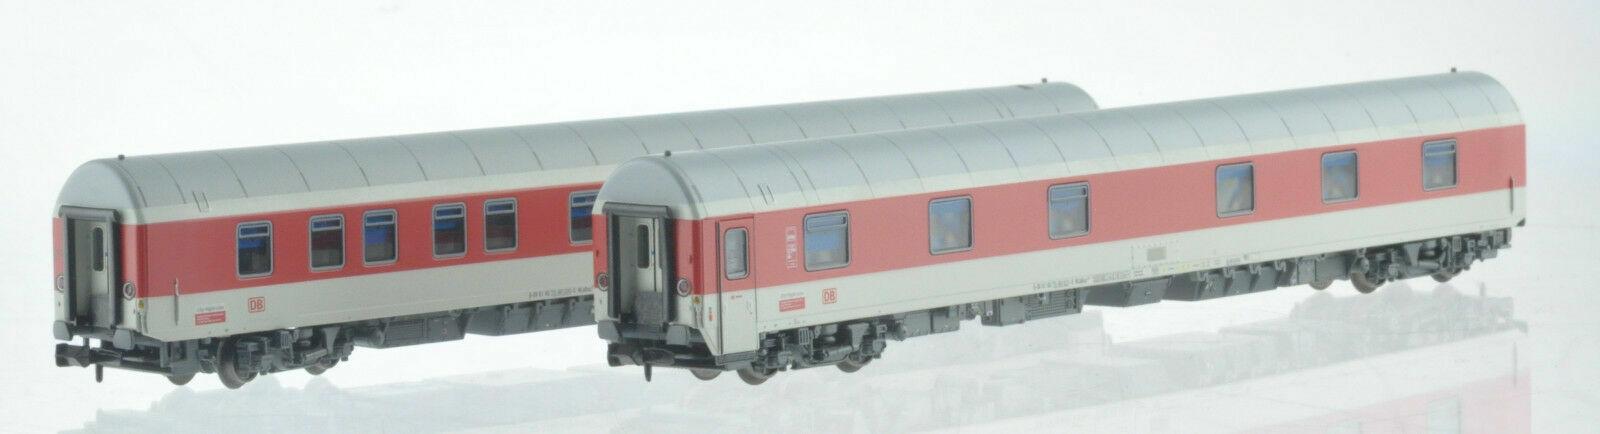 Pirata lemke LC 96910 n DB AG CNL 2x coche-cama tren rojo blancoo ep6 nuevo + embalaje original